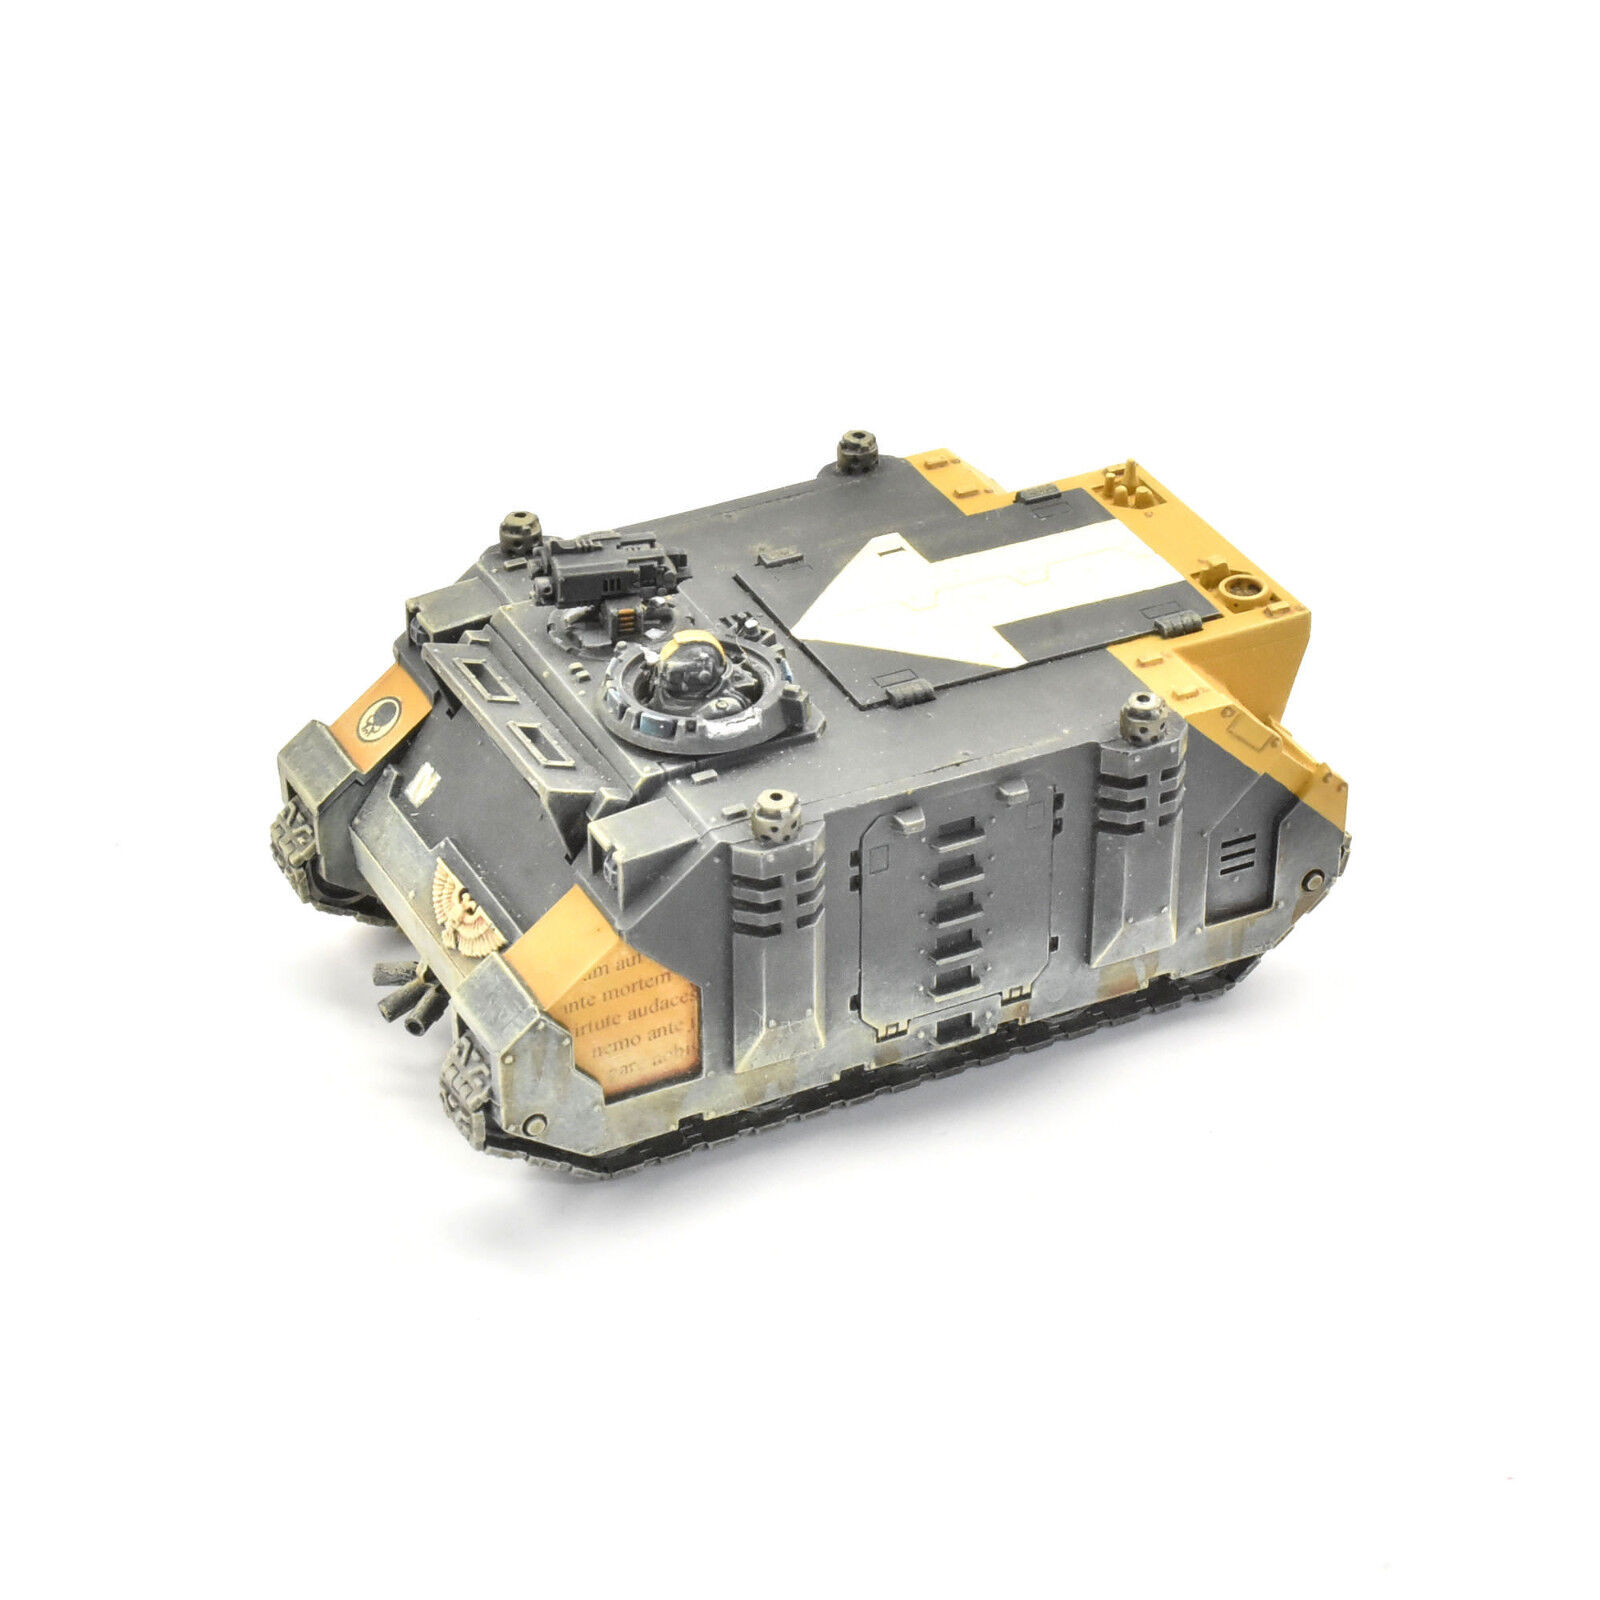 SPACE MARINES Rhino Tank  3 PRO PAINTED 40K rouge Scorpions army